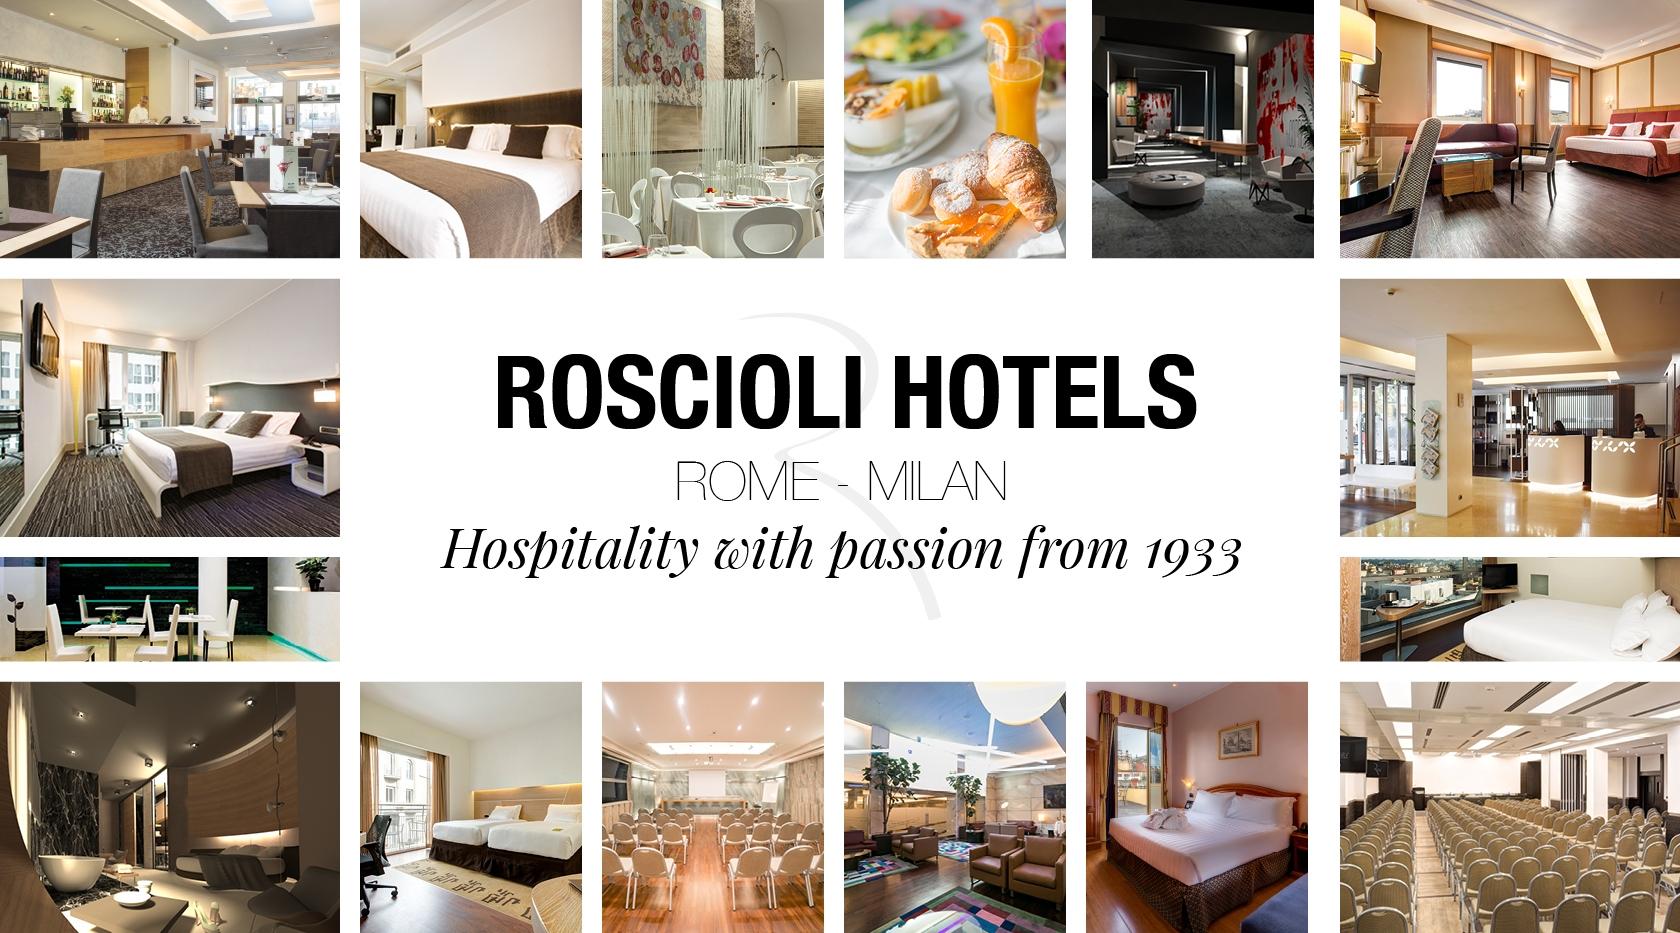 Gruppo Roscioli Hotels Roma